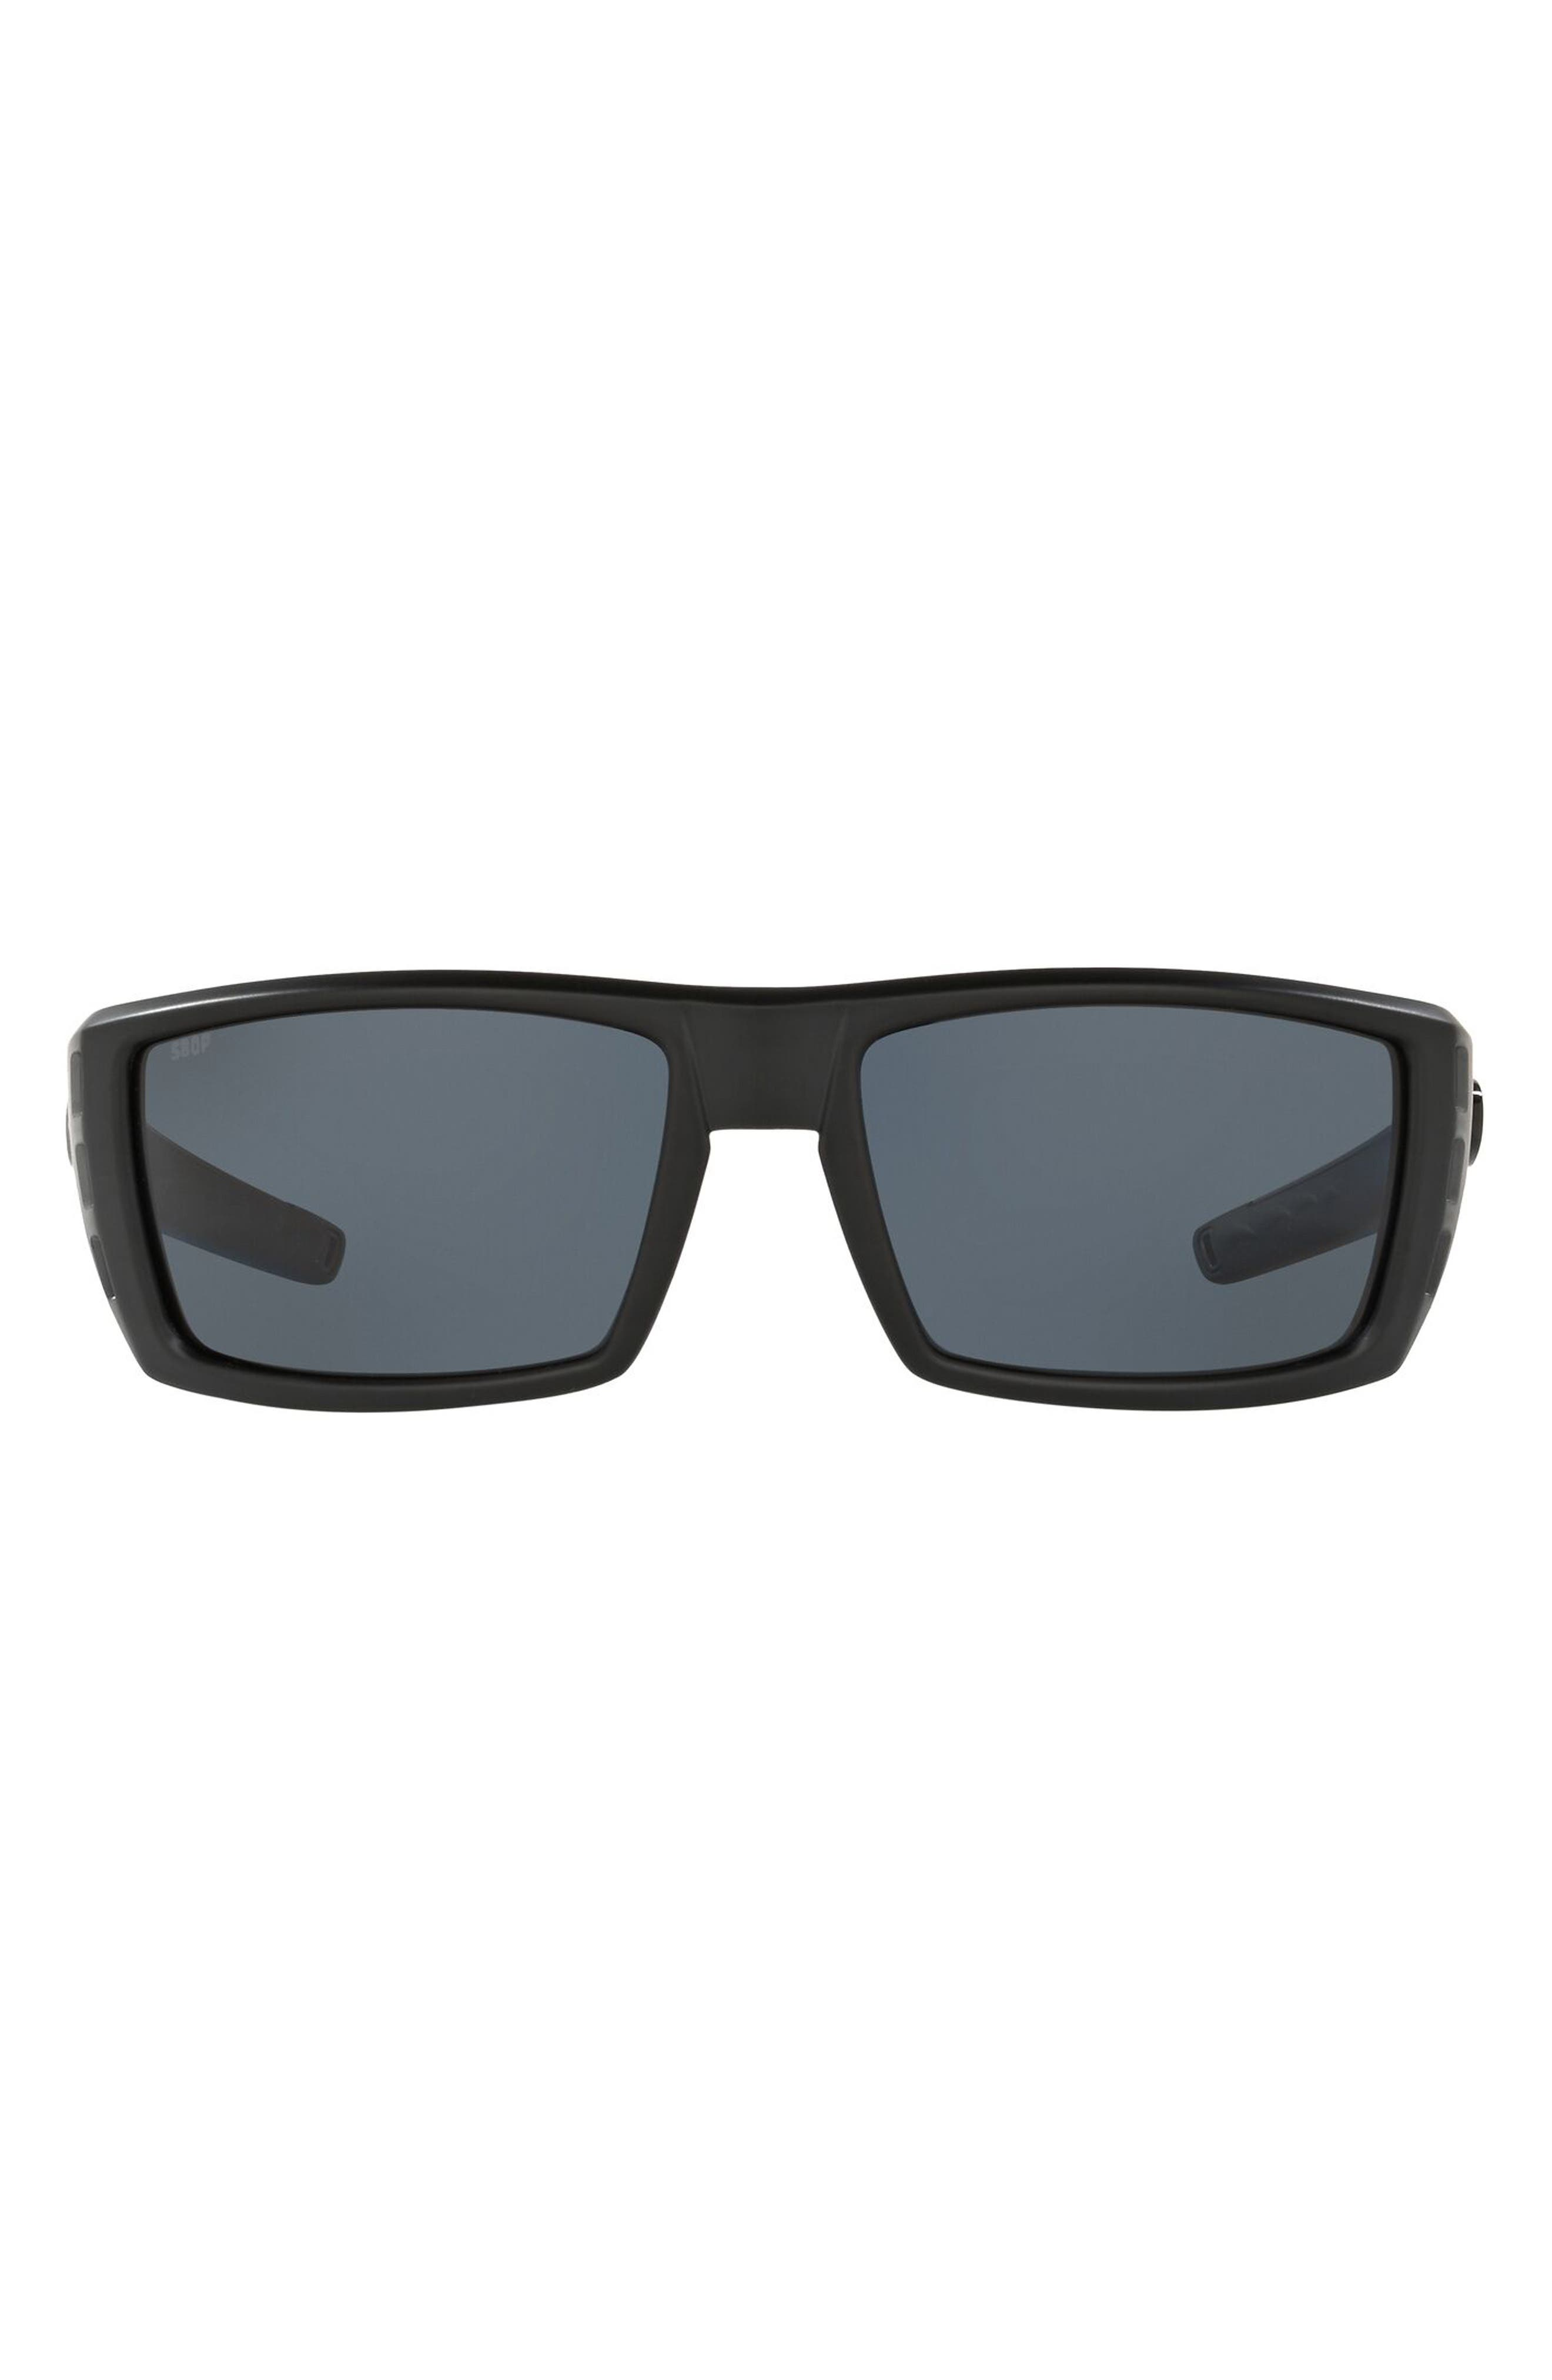 59mm Polarized Rectangle Sunglasses